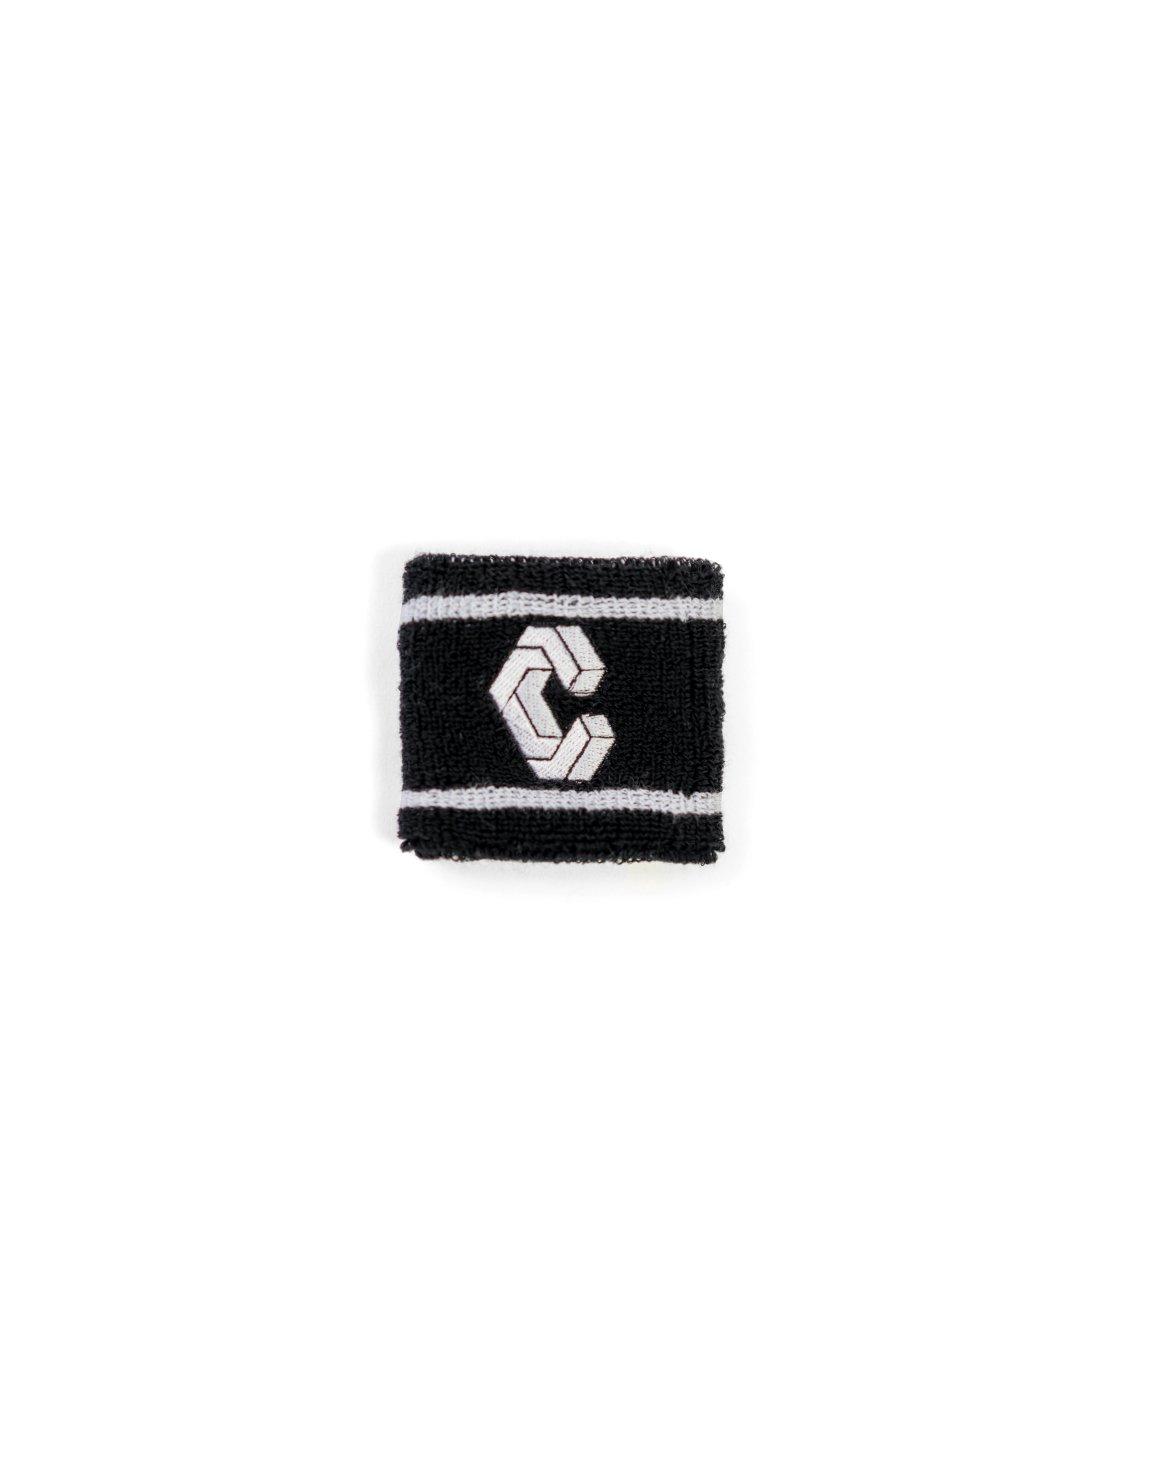 CRONOS Wristband BLACK